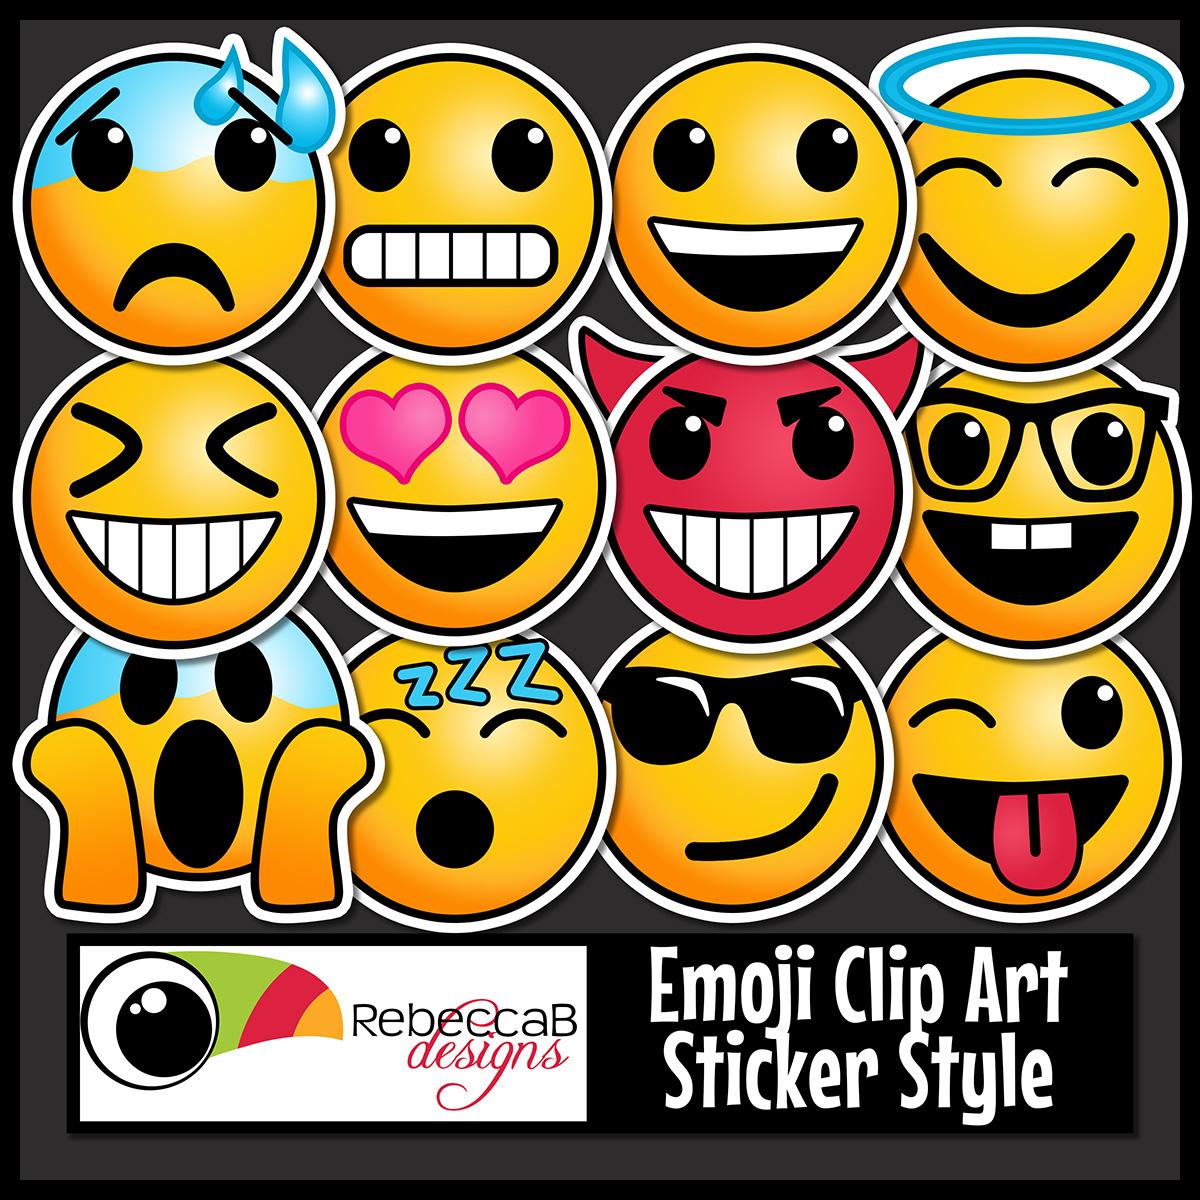 rebeccab designs free clip art free poop envy or puke